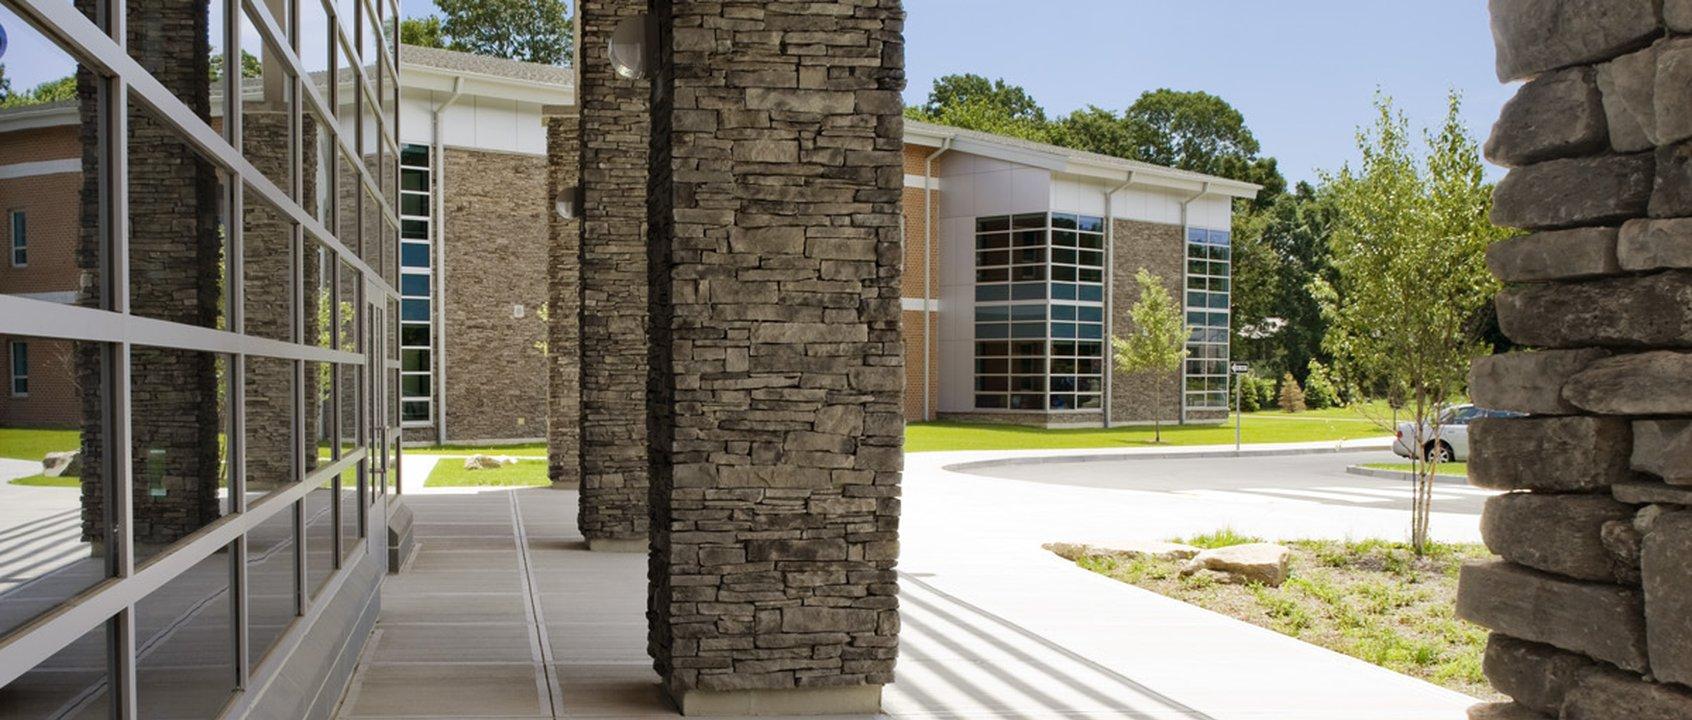 Groton Elementary Schools. Groton, CT. JCJ_NE_Academy_01_ExtFront.jpg  JCJ_NE_Academy_04_ExtWalkway.jpg ...